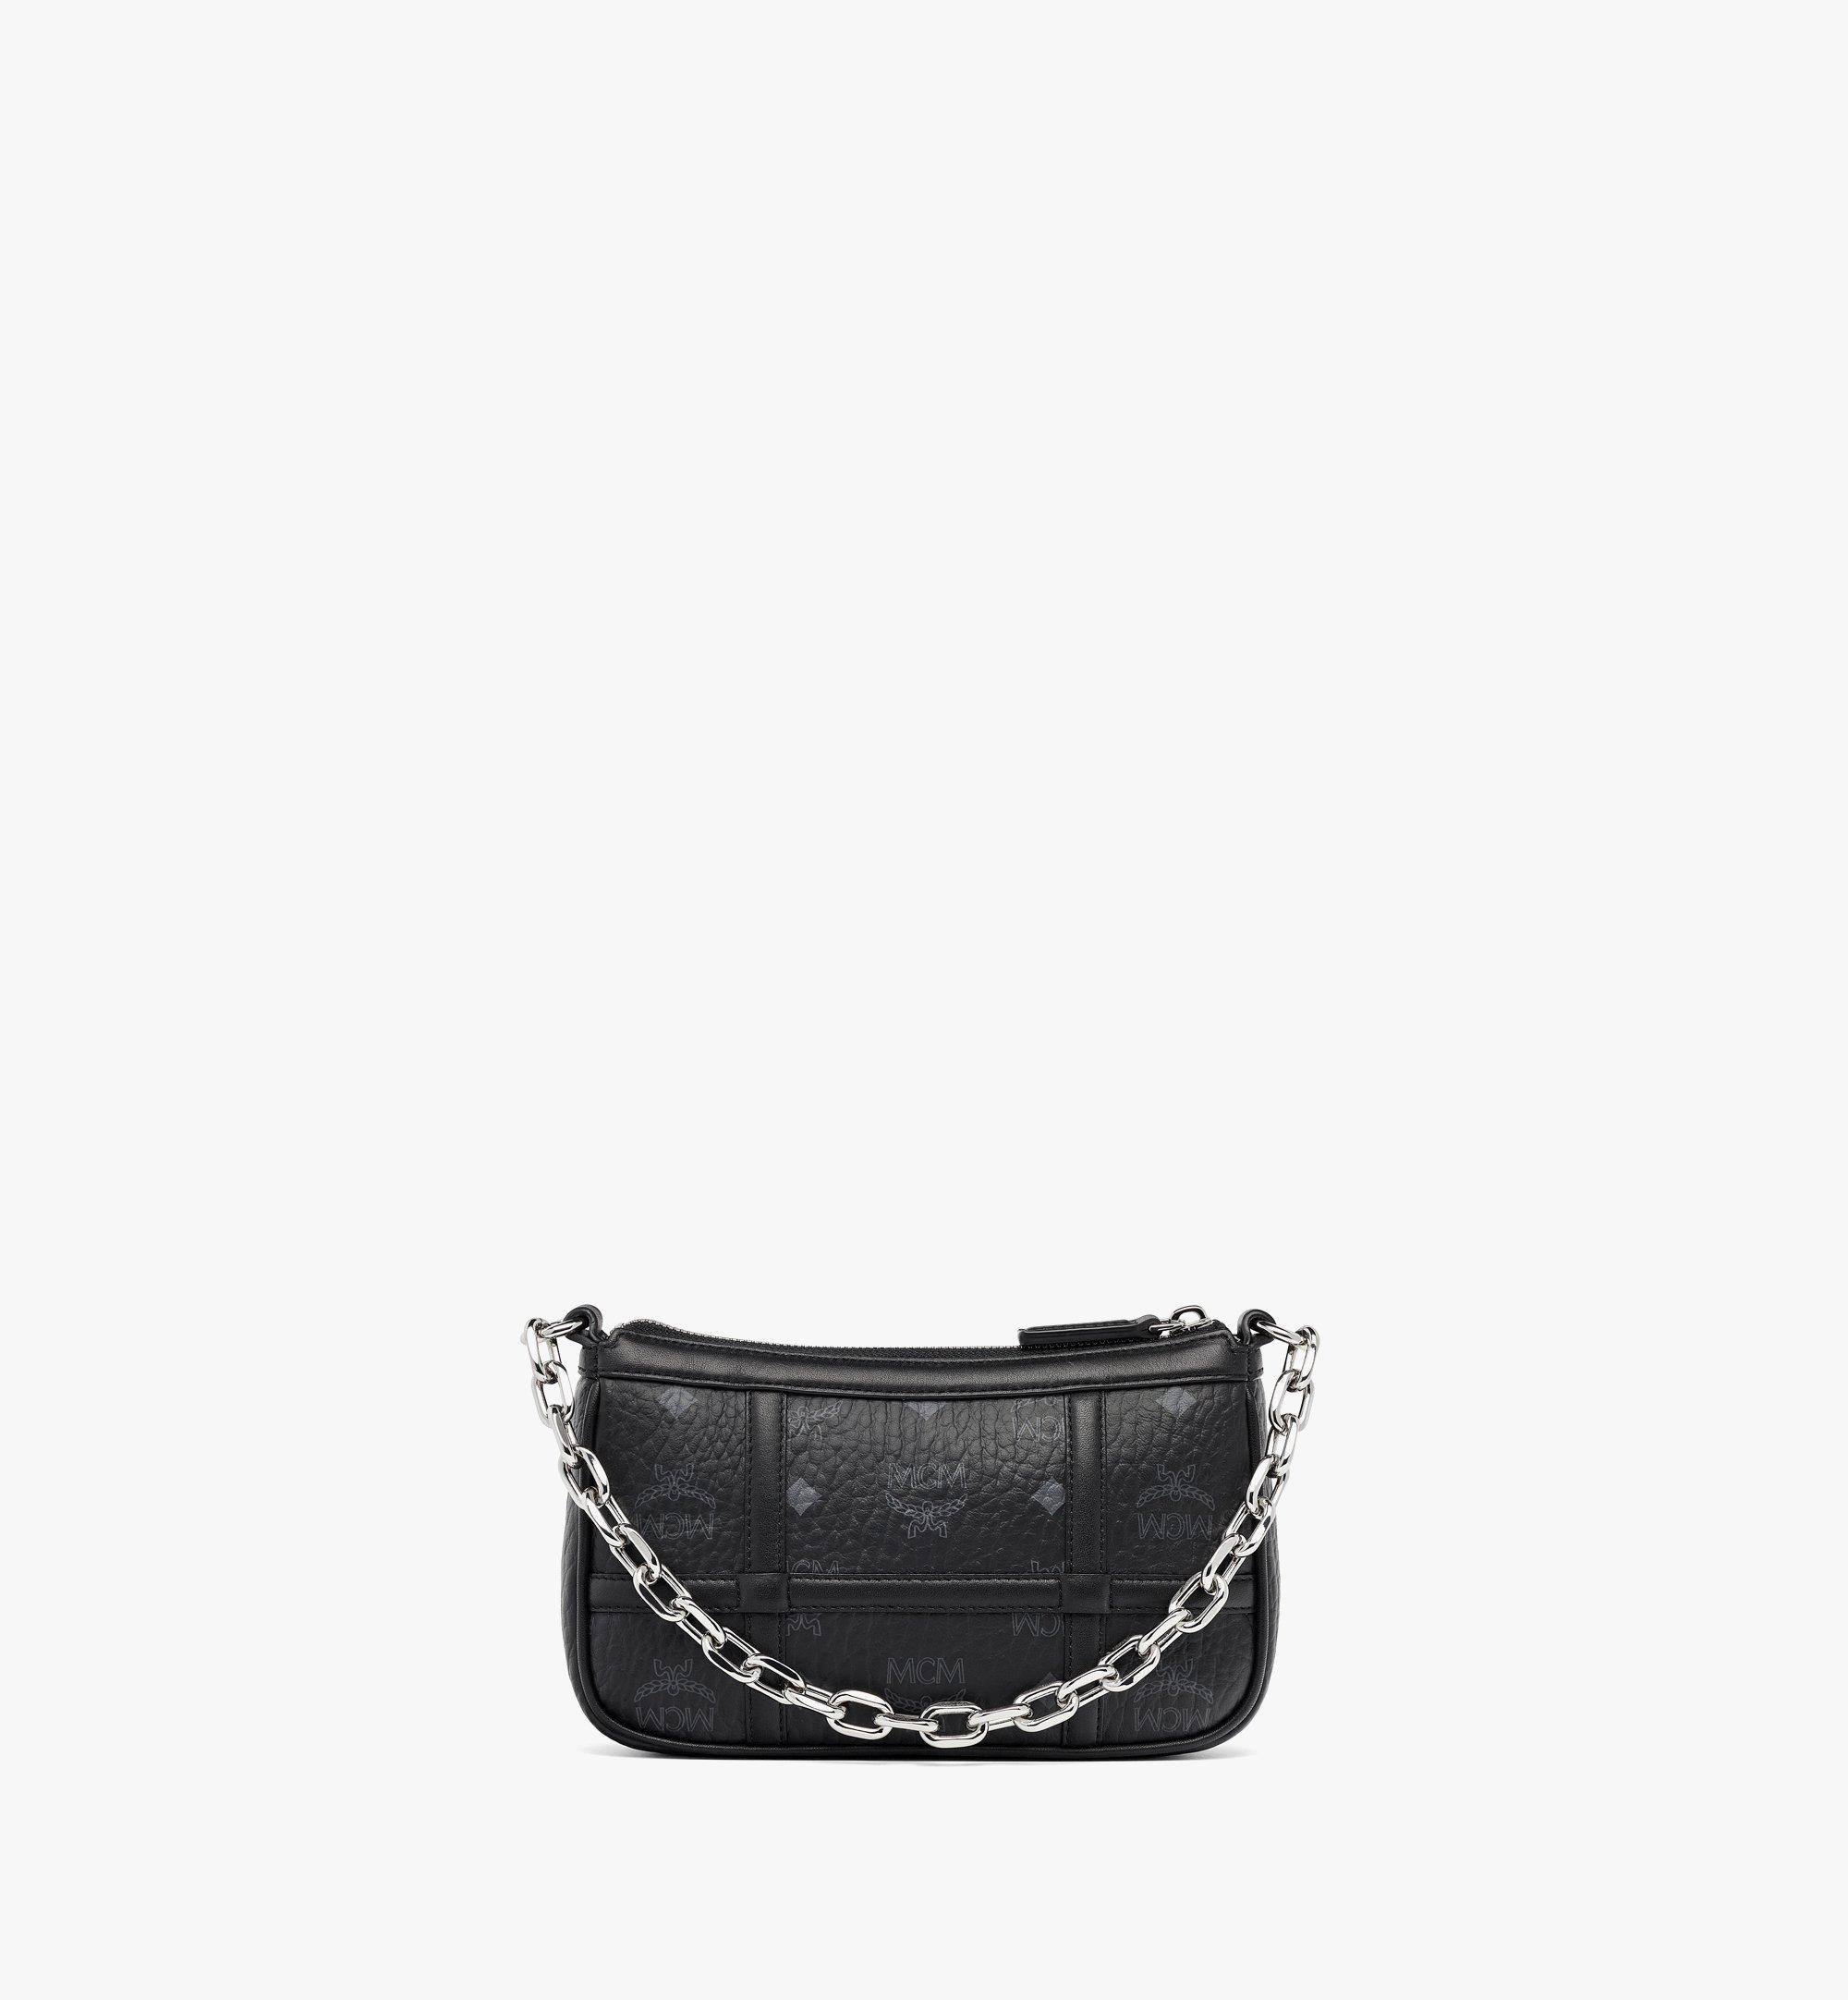 MCM Delmy Shoulder Bag in Visetos Black MWSBAER01BK001 Alternate View 1